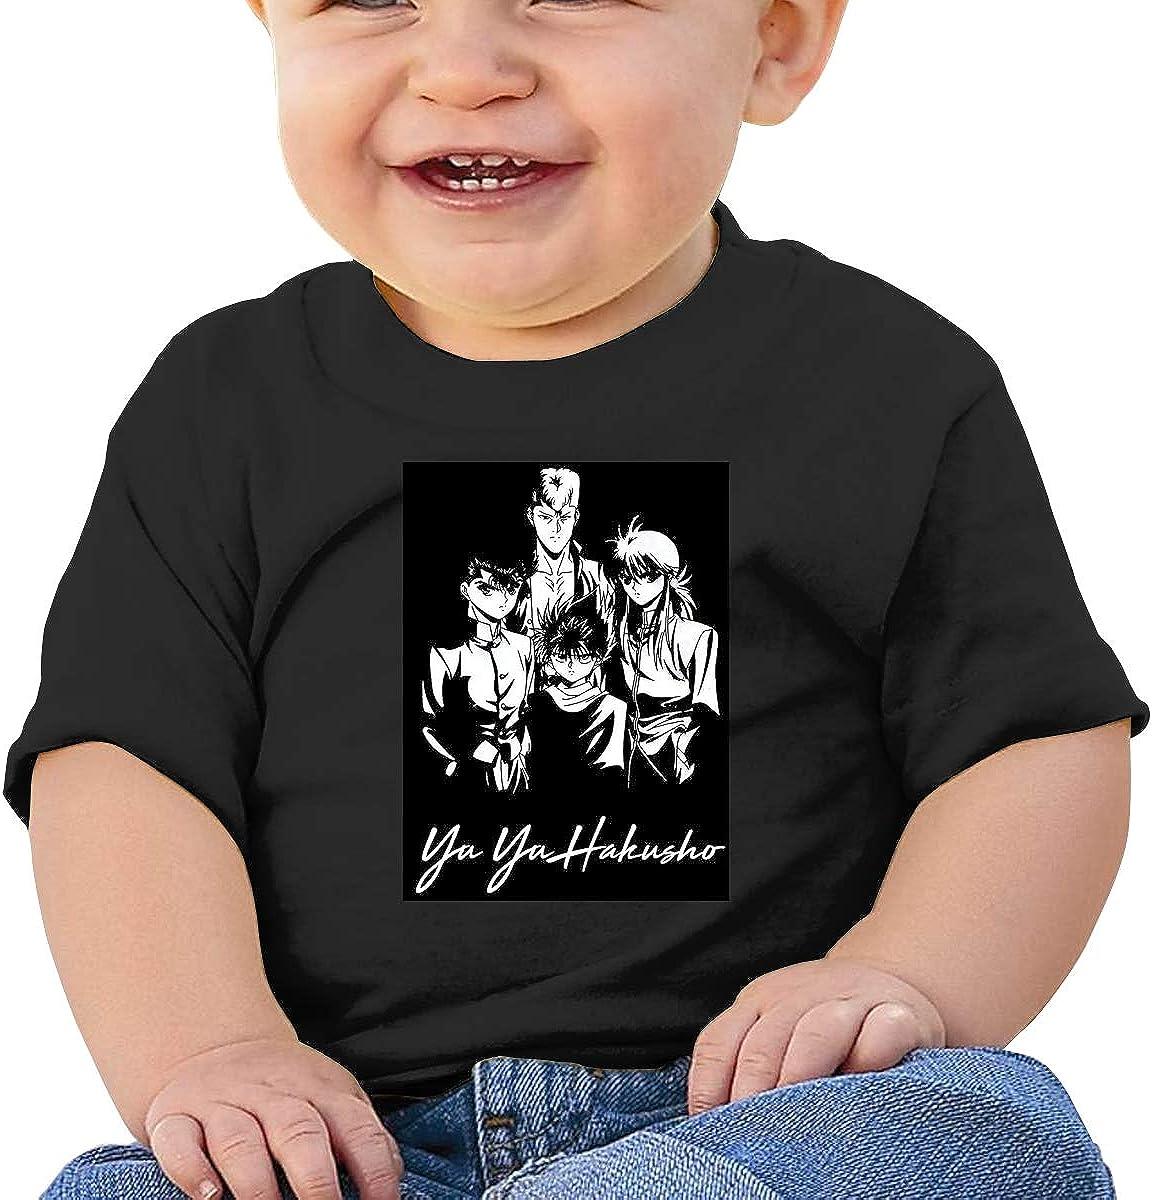 Kangtians Baby Yu Yu Hakusho Short Sleeve Shirt Toddler Tee